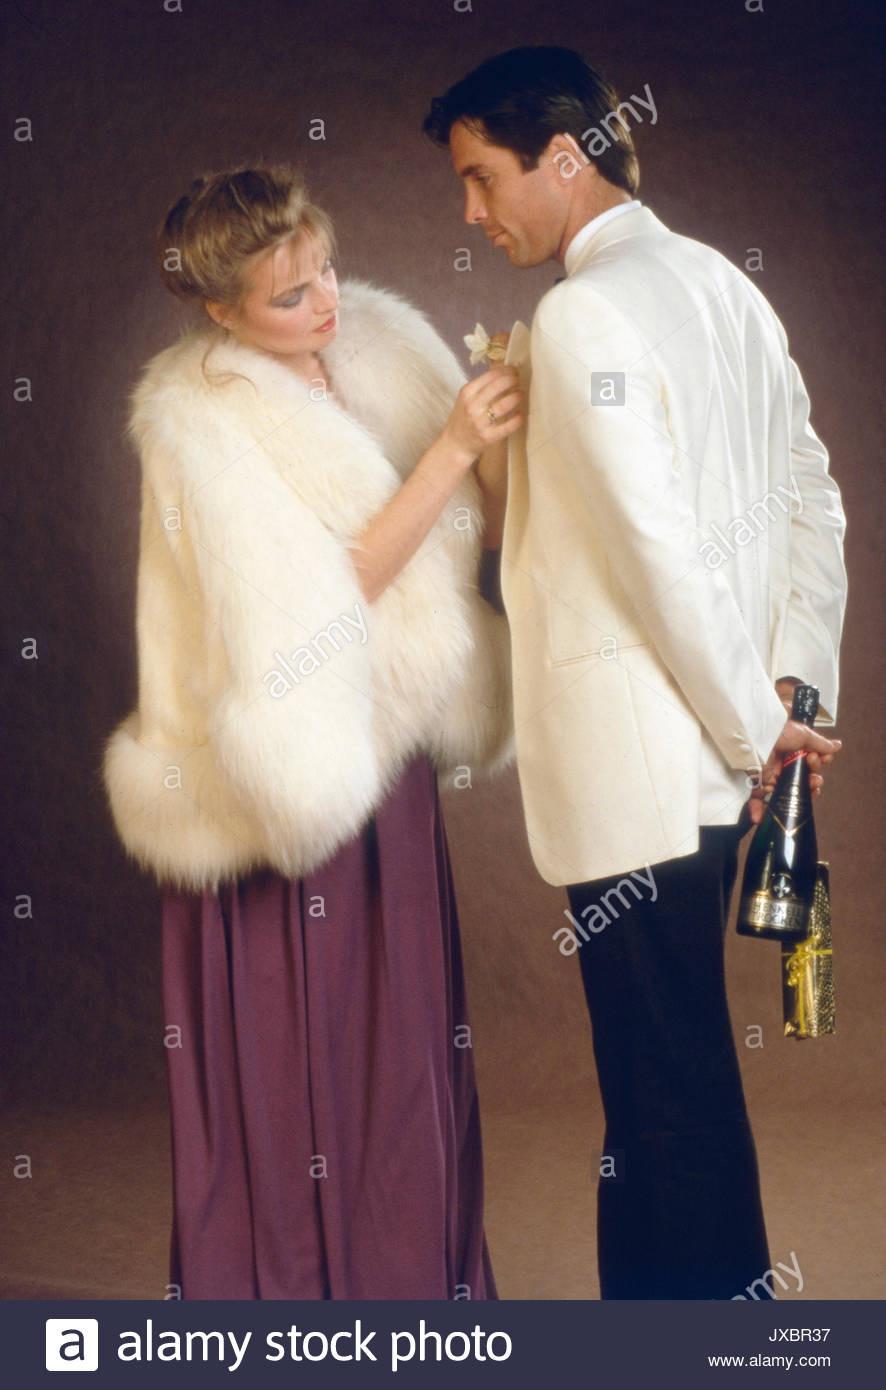 Designer Wunderbar Dresscode Abendkleidung GalerieFormal Top Dresscode Abendkleidung Boutique